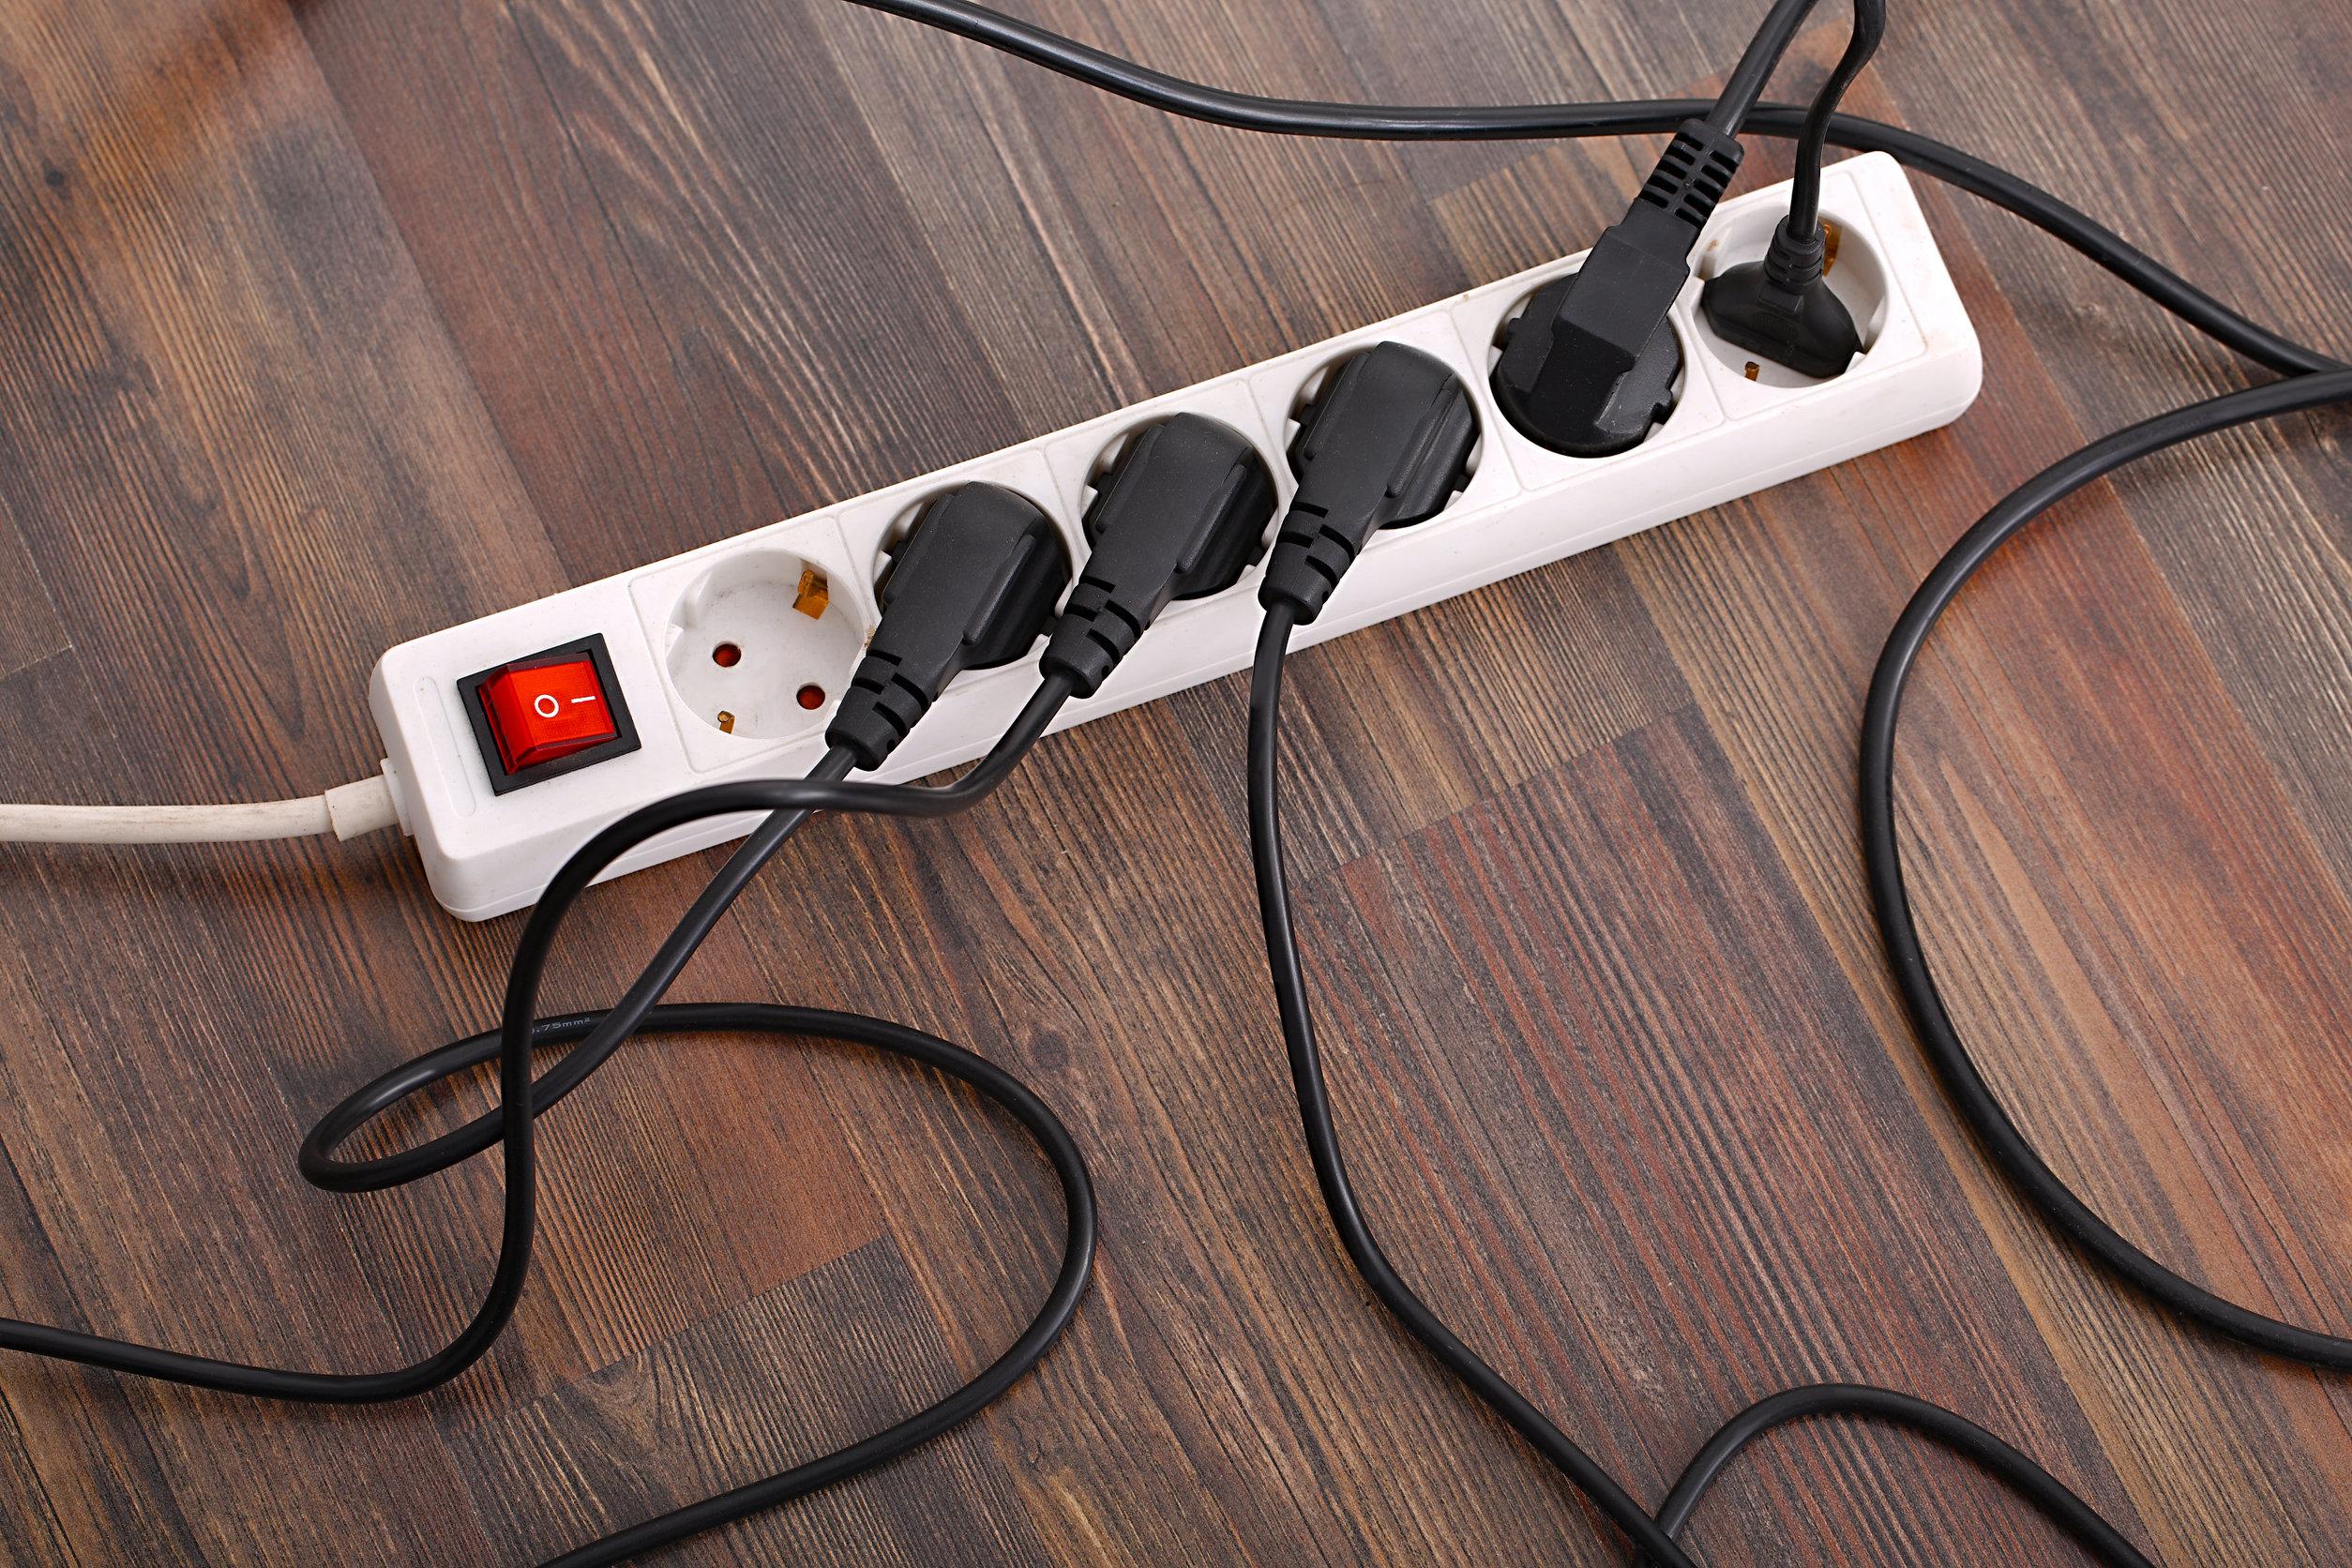 Extensión para cables